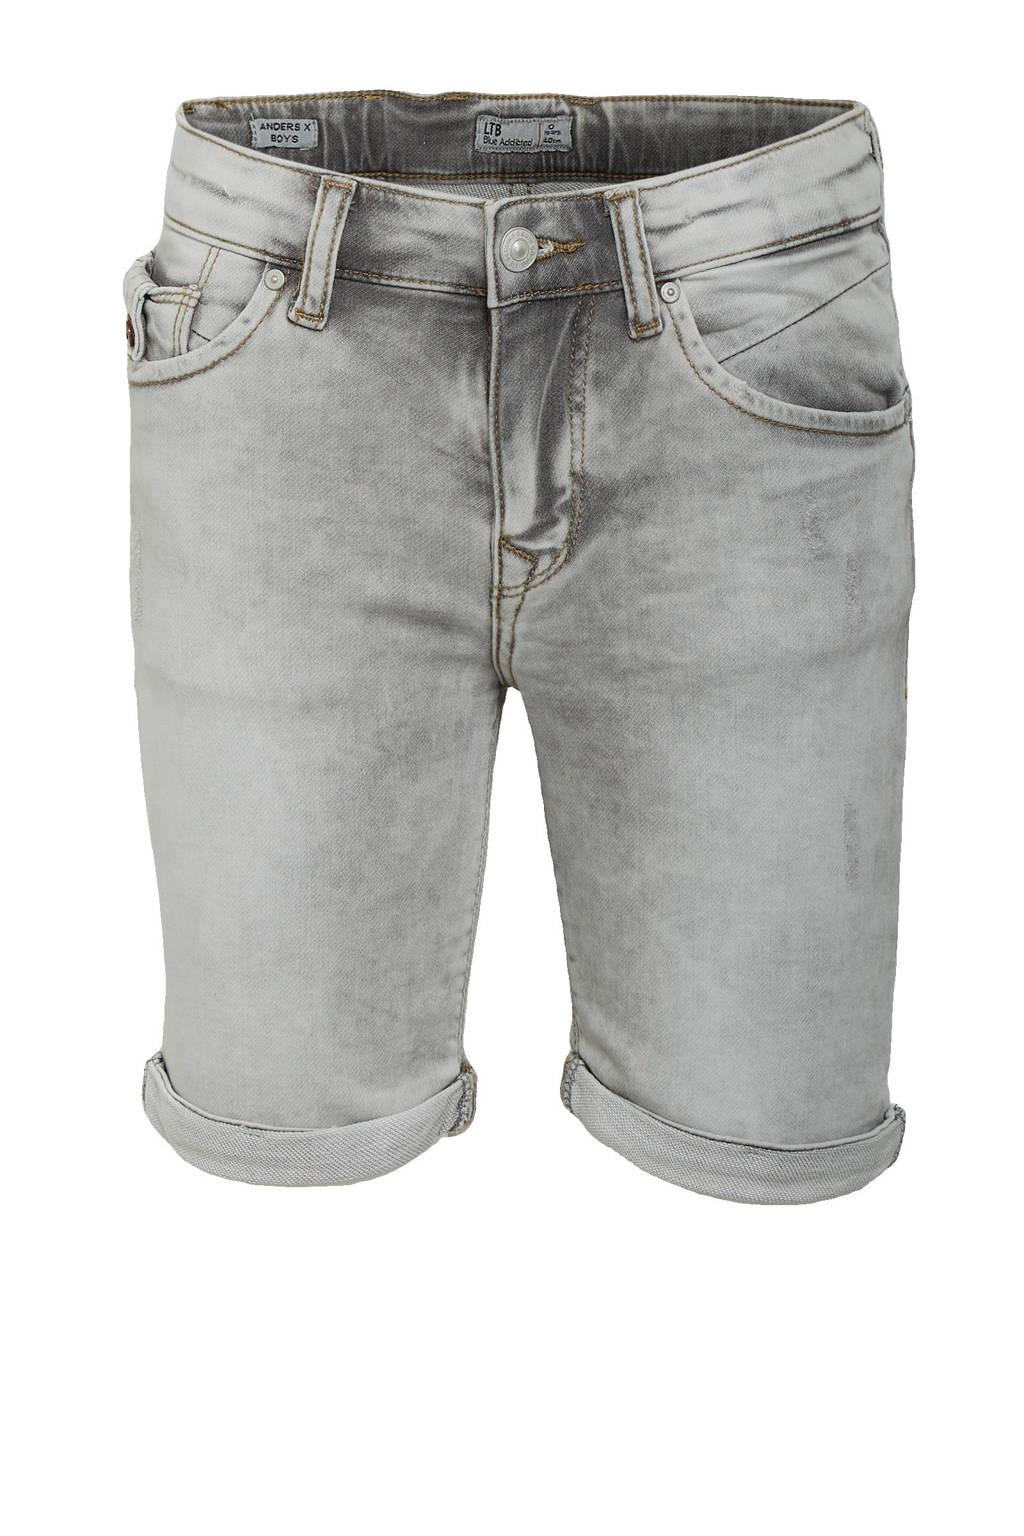 LTB slim fit jeans bermuda Anders X grey ice wash, Grey Ice Wash